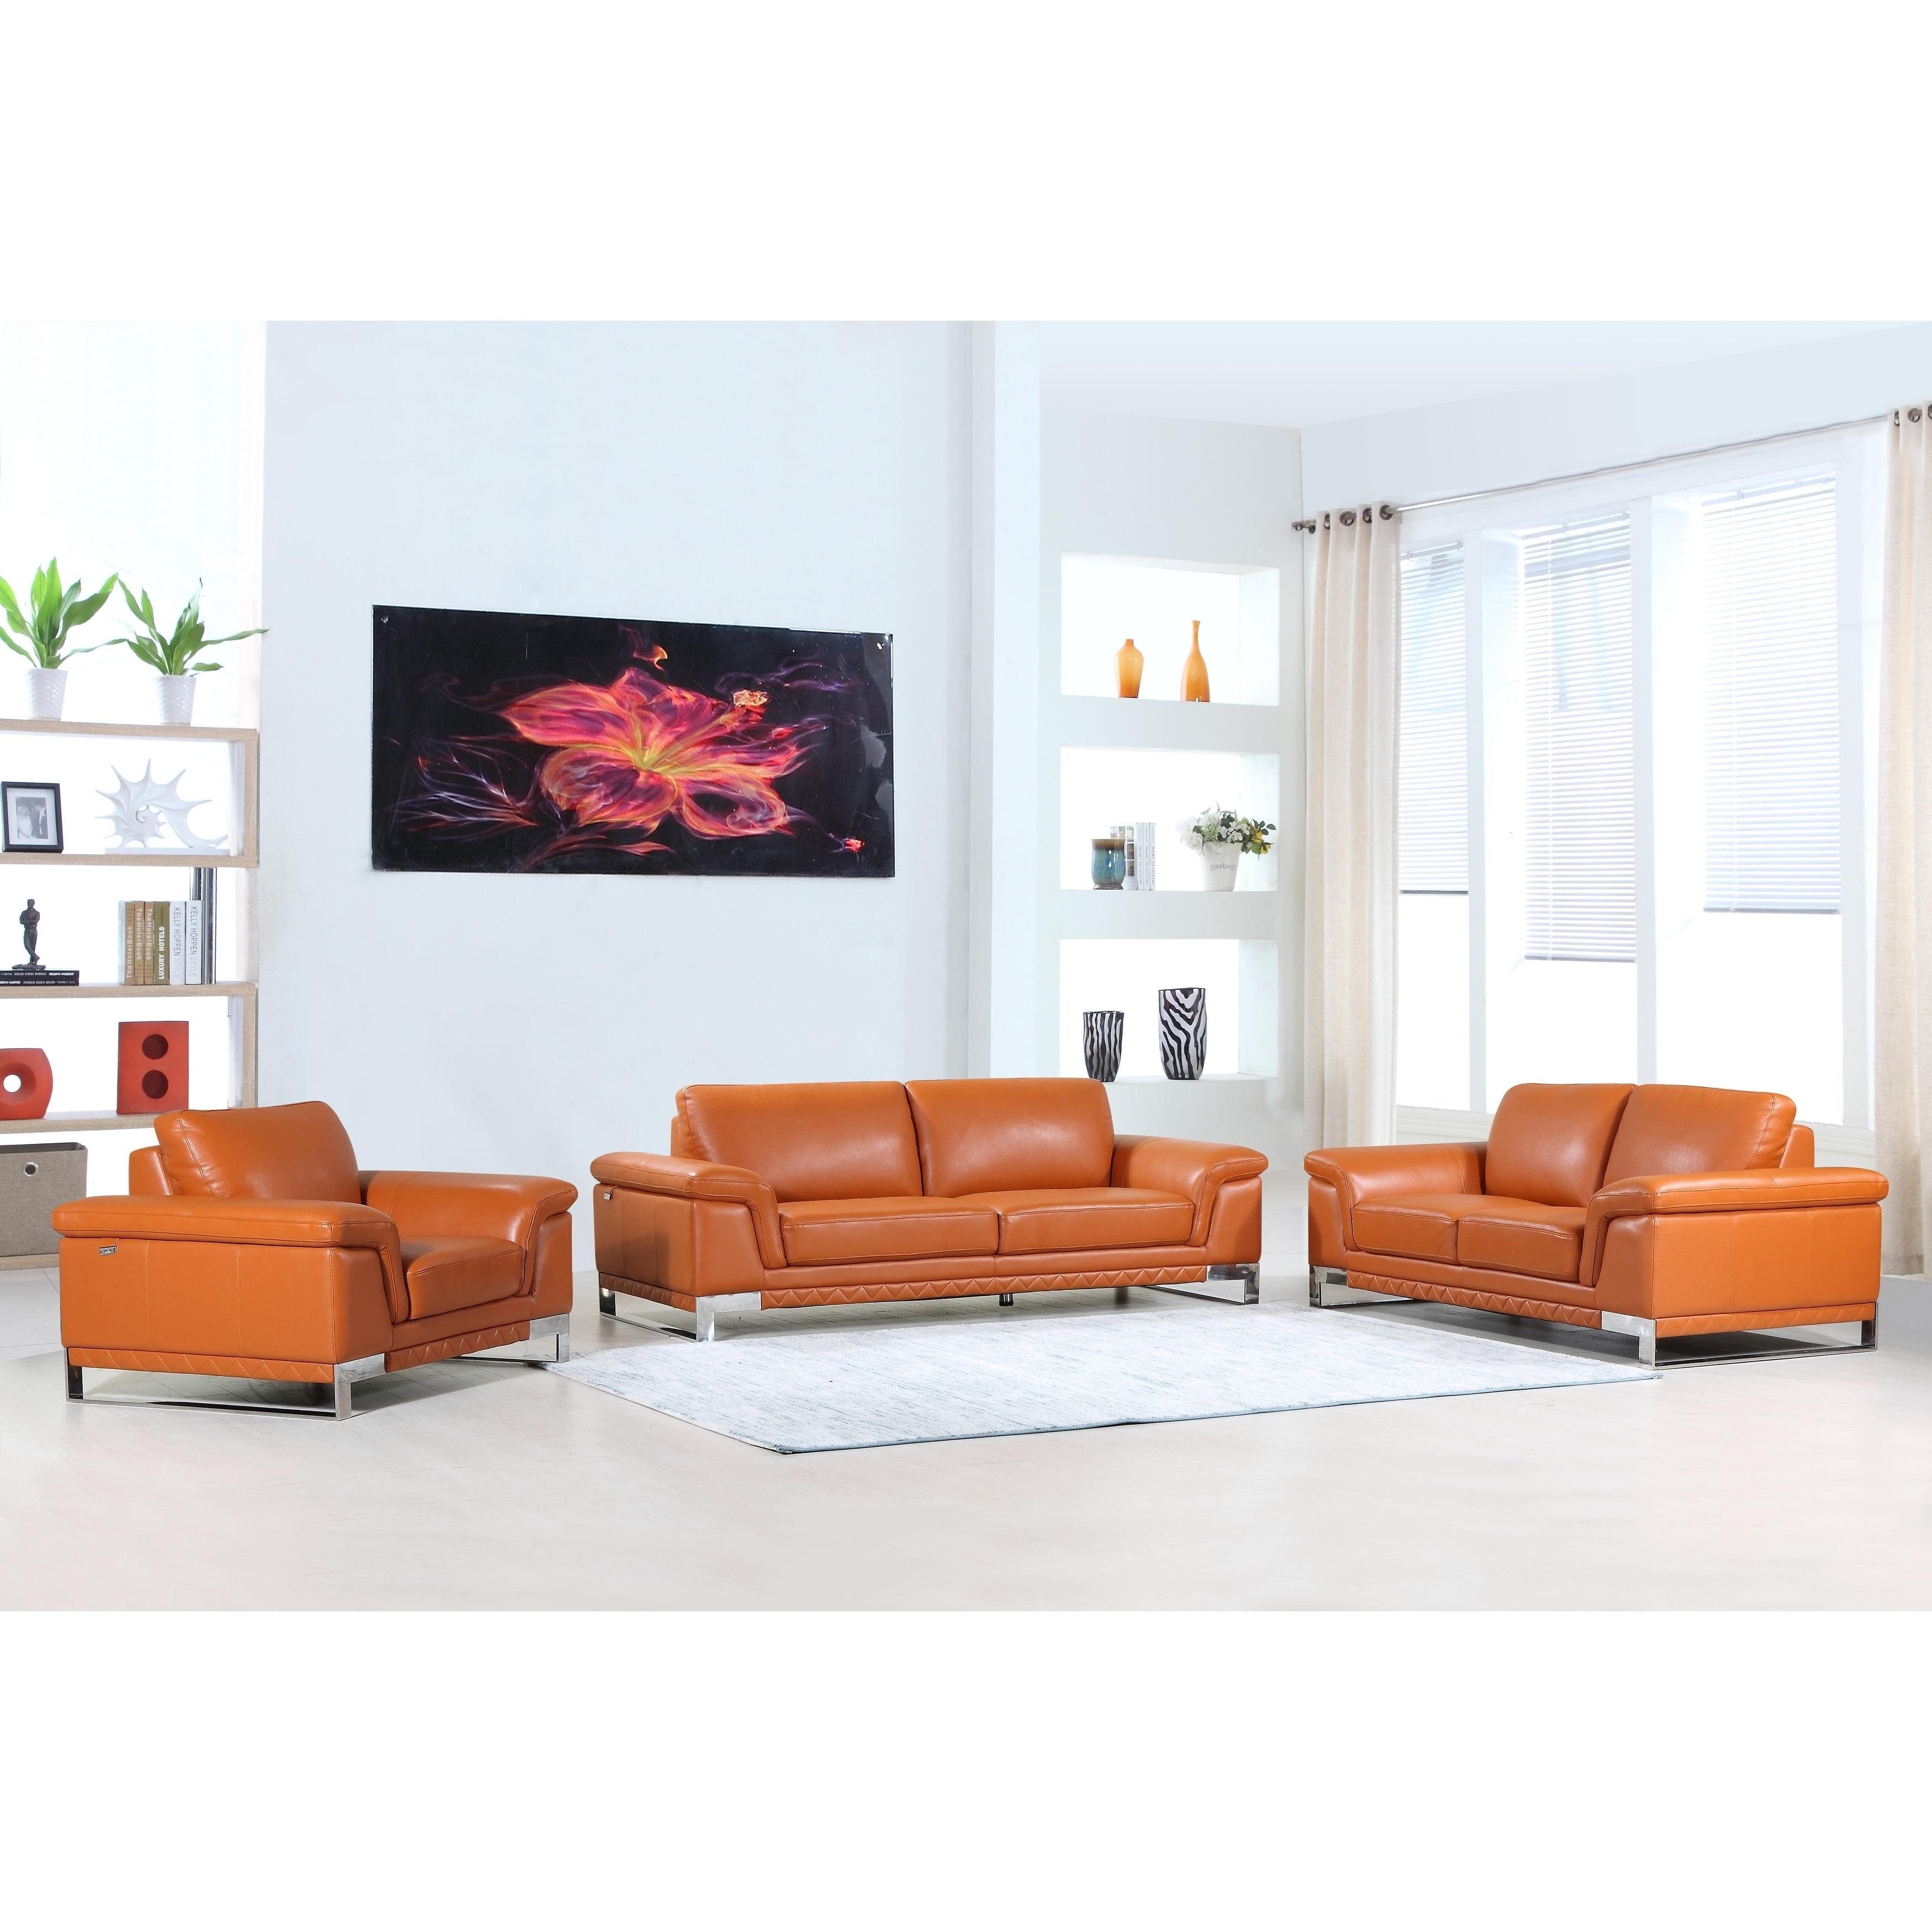 Shop DivanItalia Arezzo Luxury Italian Leather Upholstered Complete ...